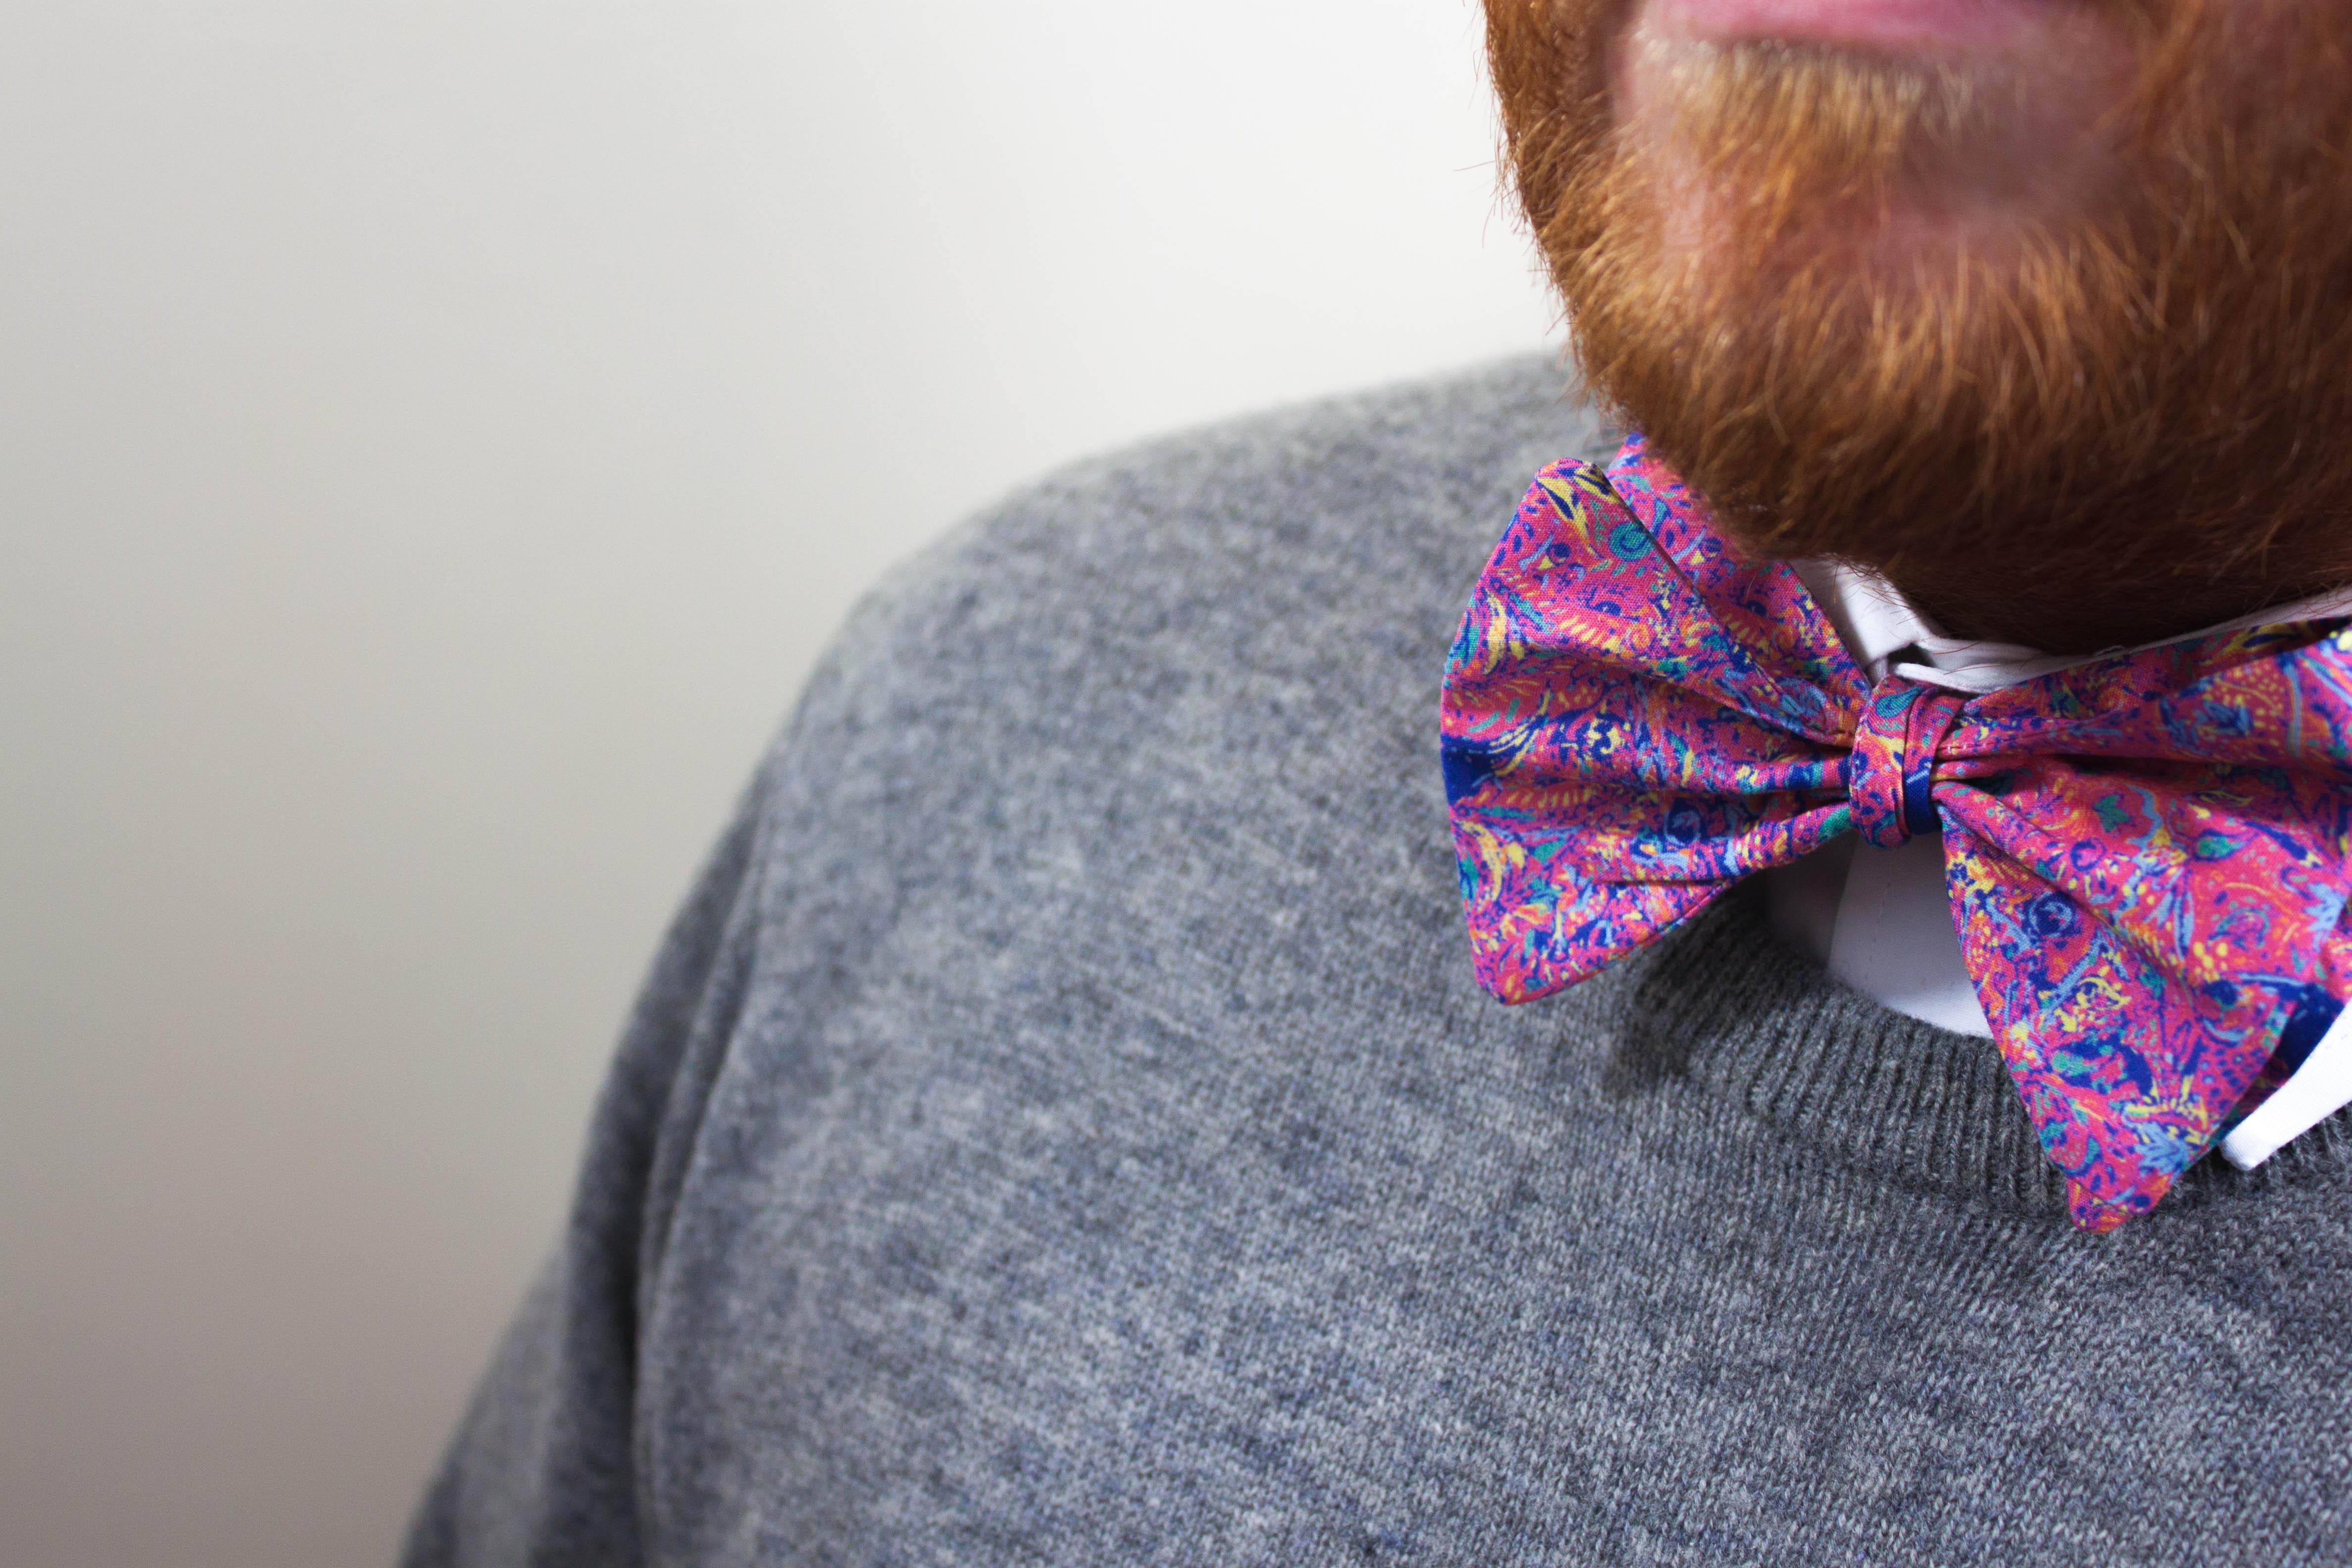 paisley, pattern,bowtie,bow,tie,print,design,josef mcfadden,beard,handmade in scotland,glasgow,renfrewshire,edinburgh,scotland,mens fashion,men,menswear,mens style,dapper,mens accessories,wedding bow ties